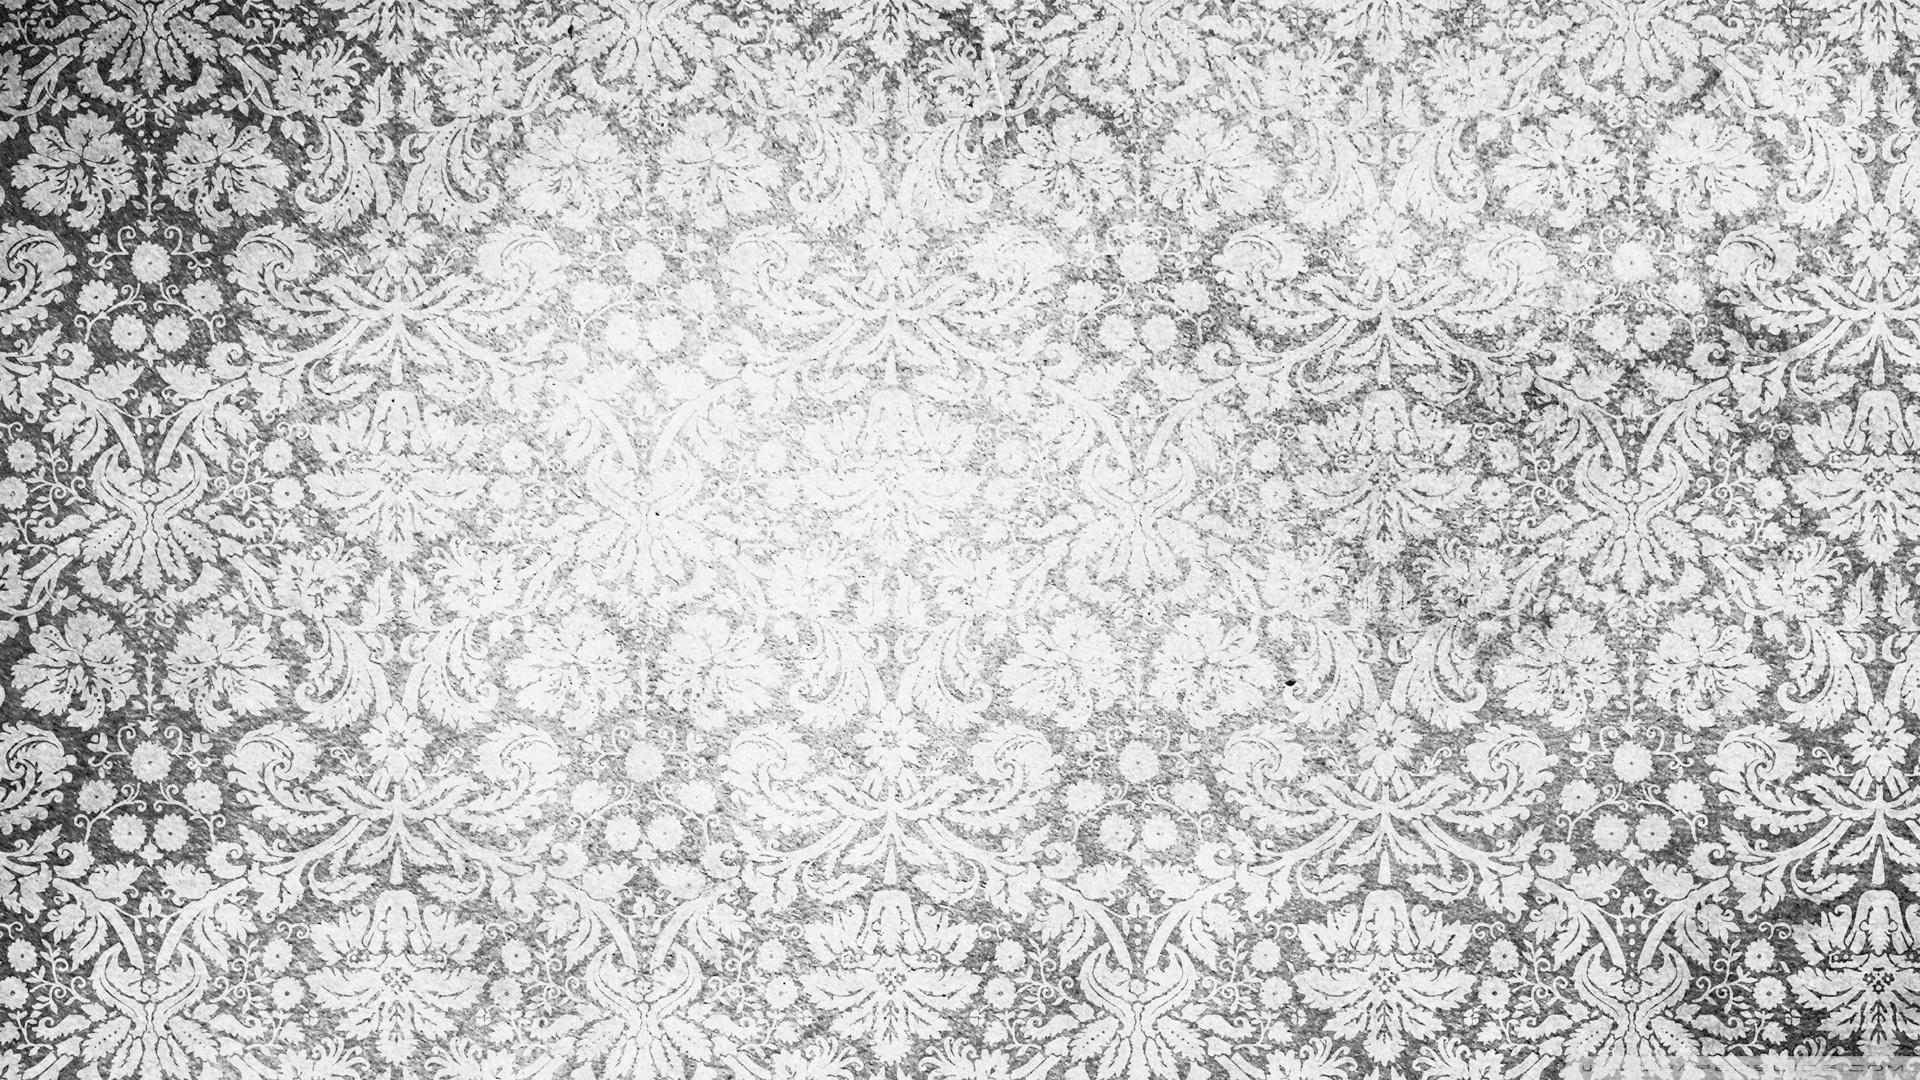 Black And White Vintage Pattern wallpaper 1920x1080